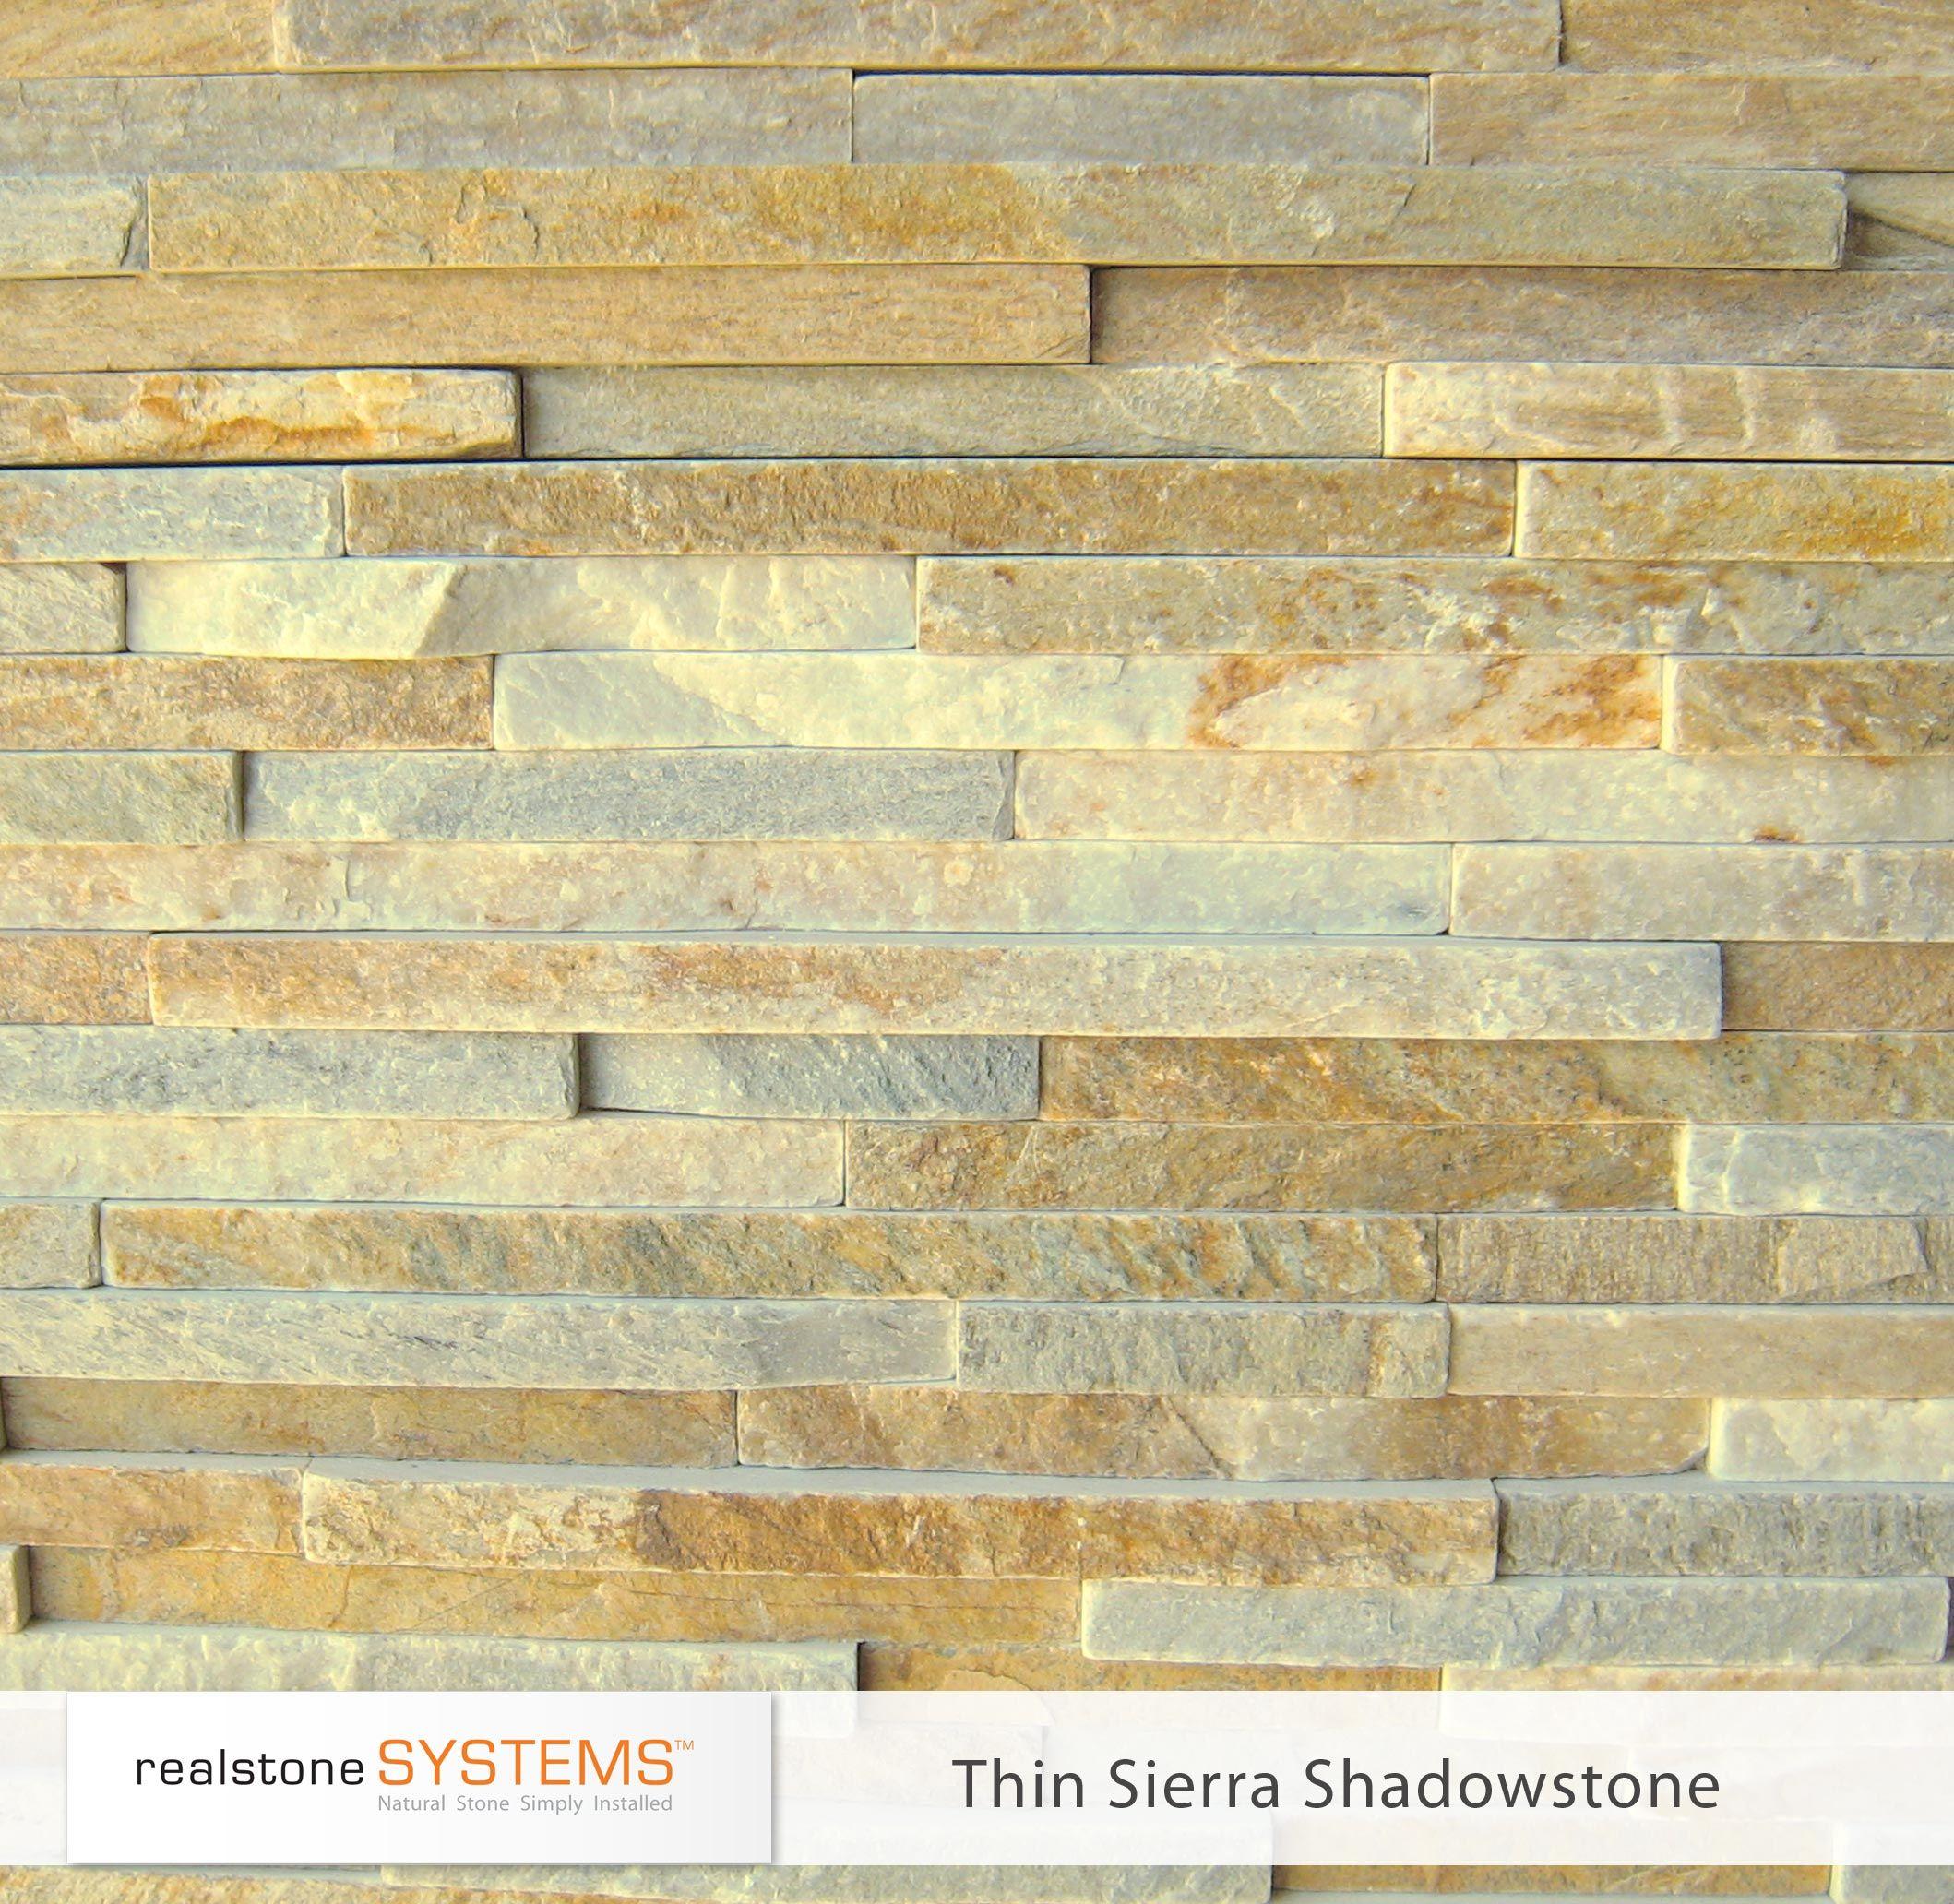 Thin Sierra Shadowstone, Thinstone Veneers from Realstone Systems ...